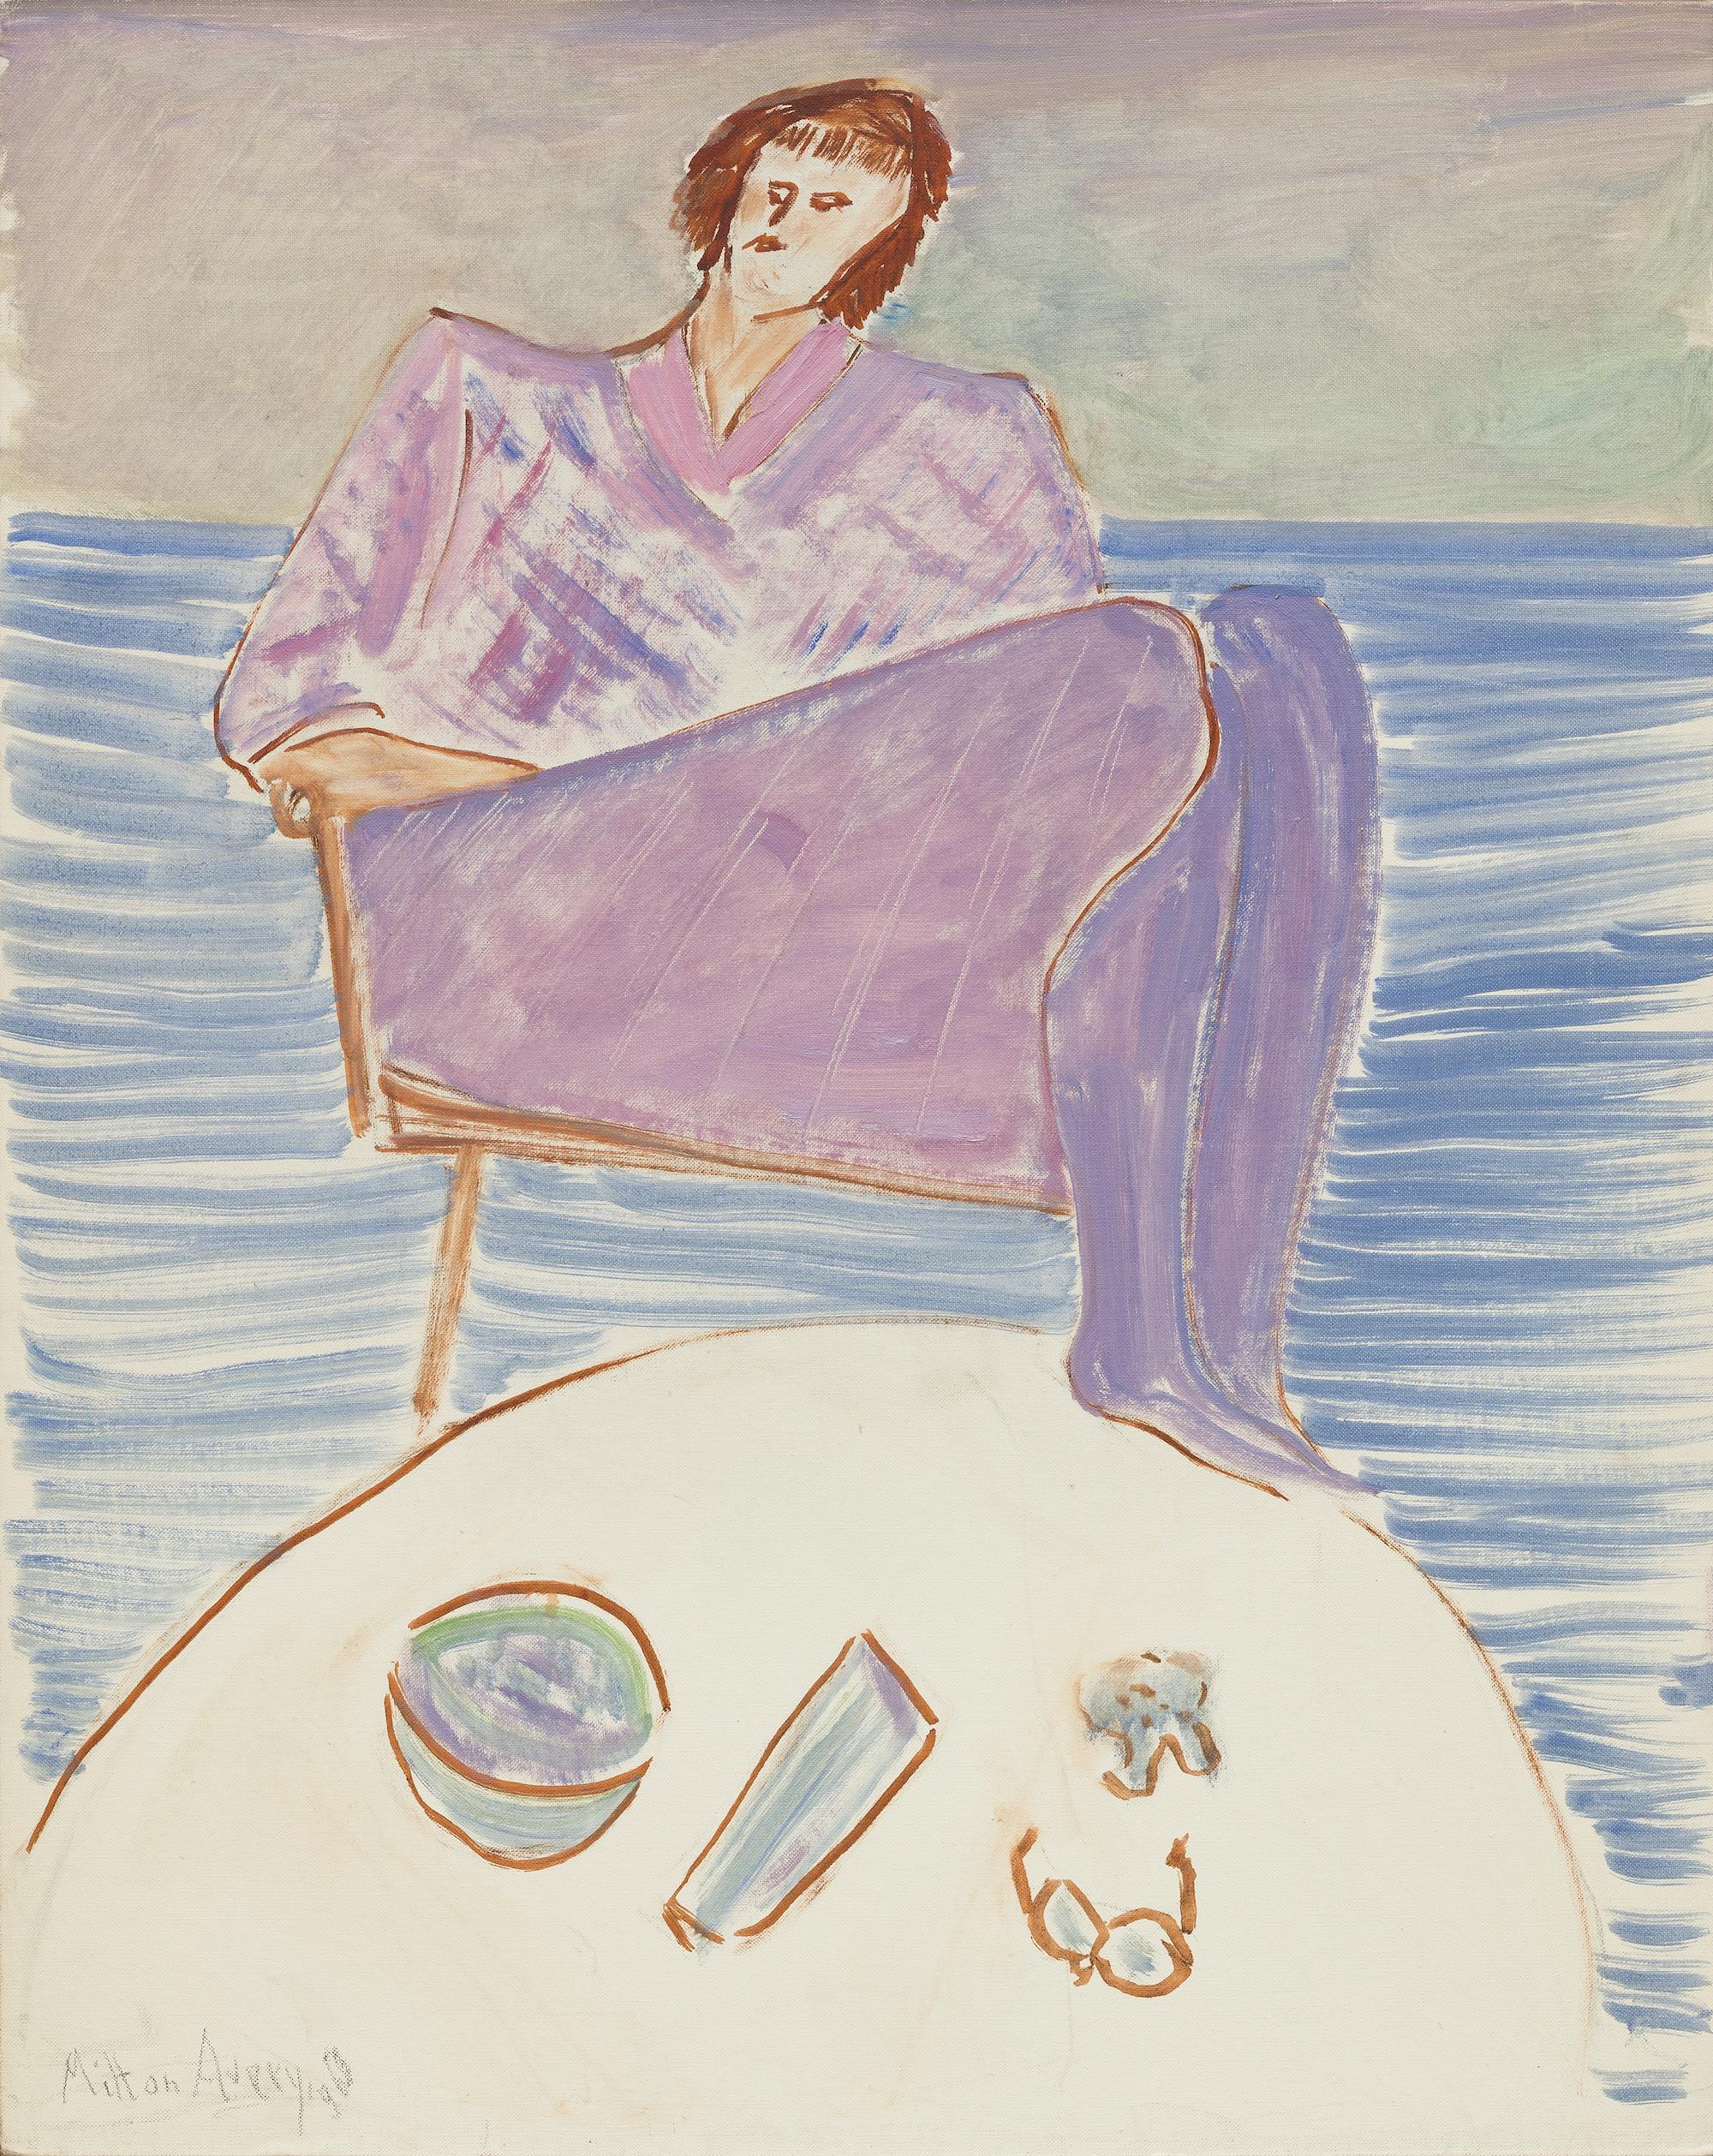 Lavender Girl, 1963